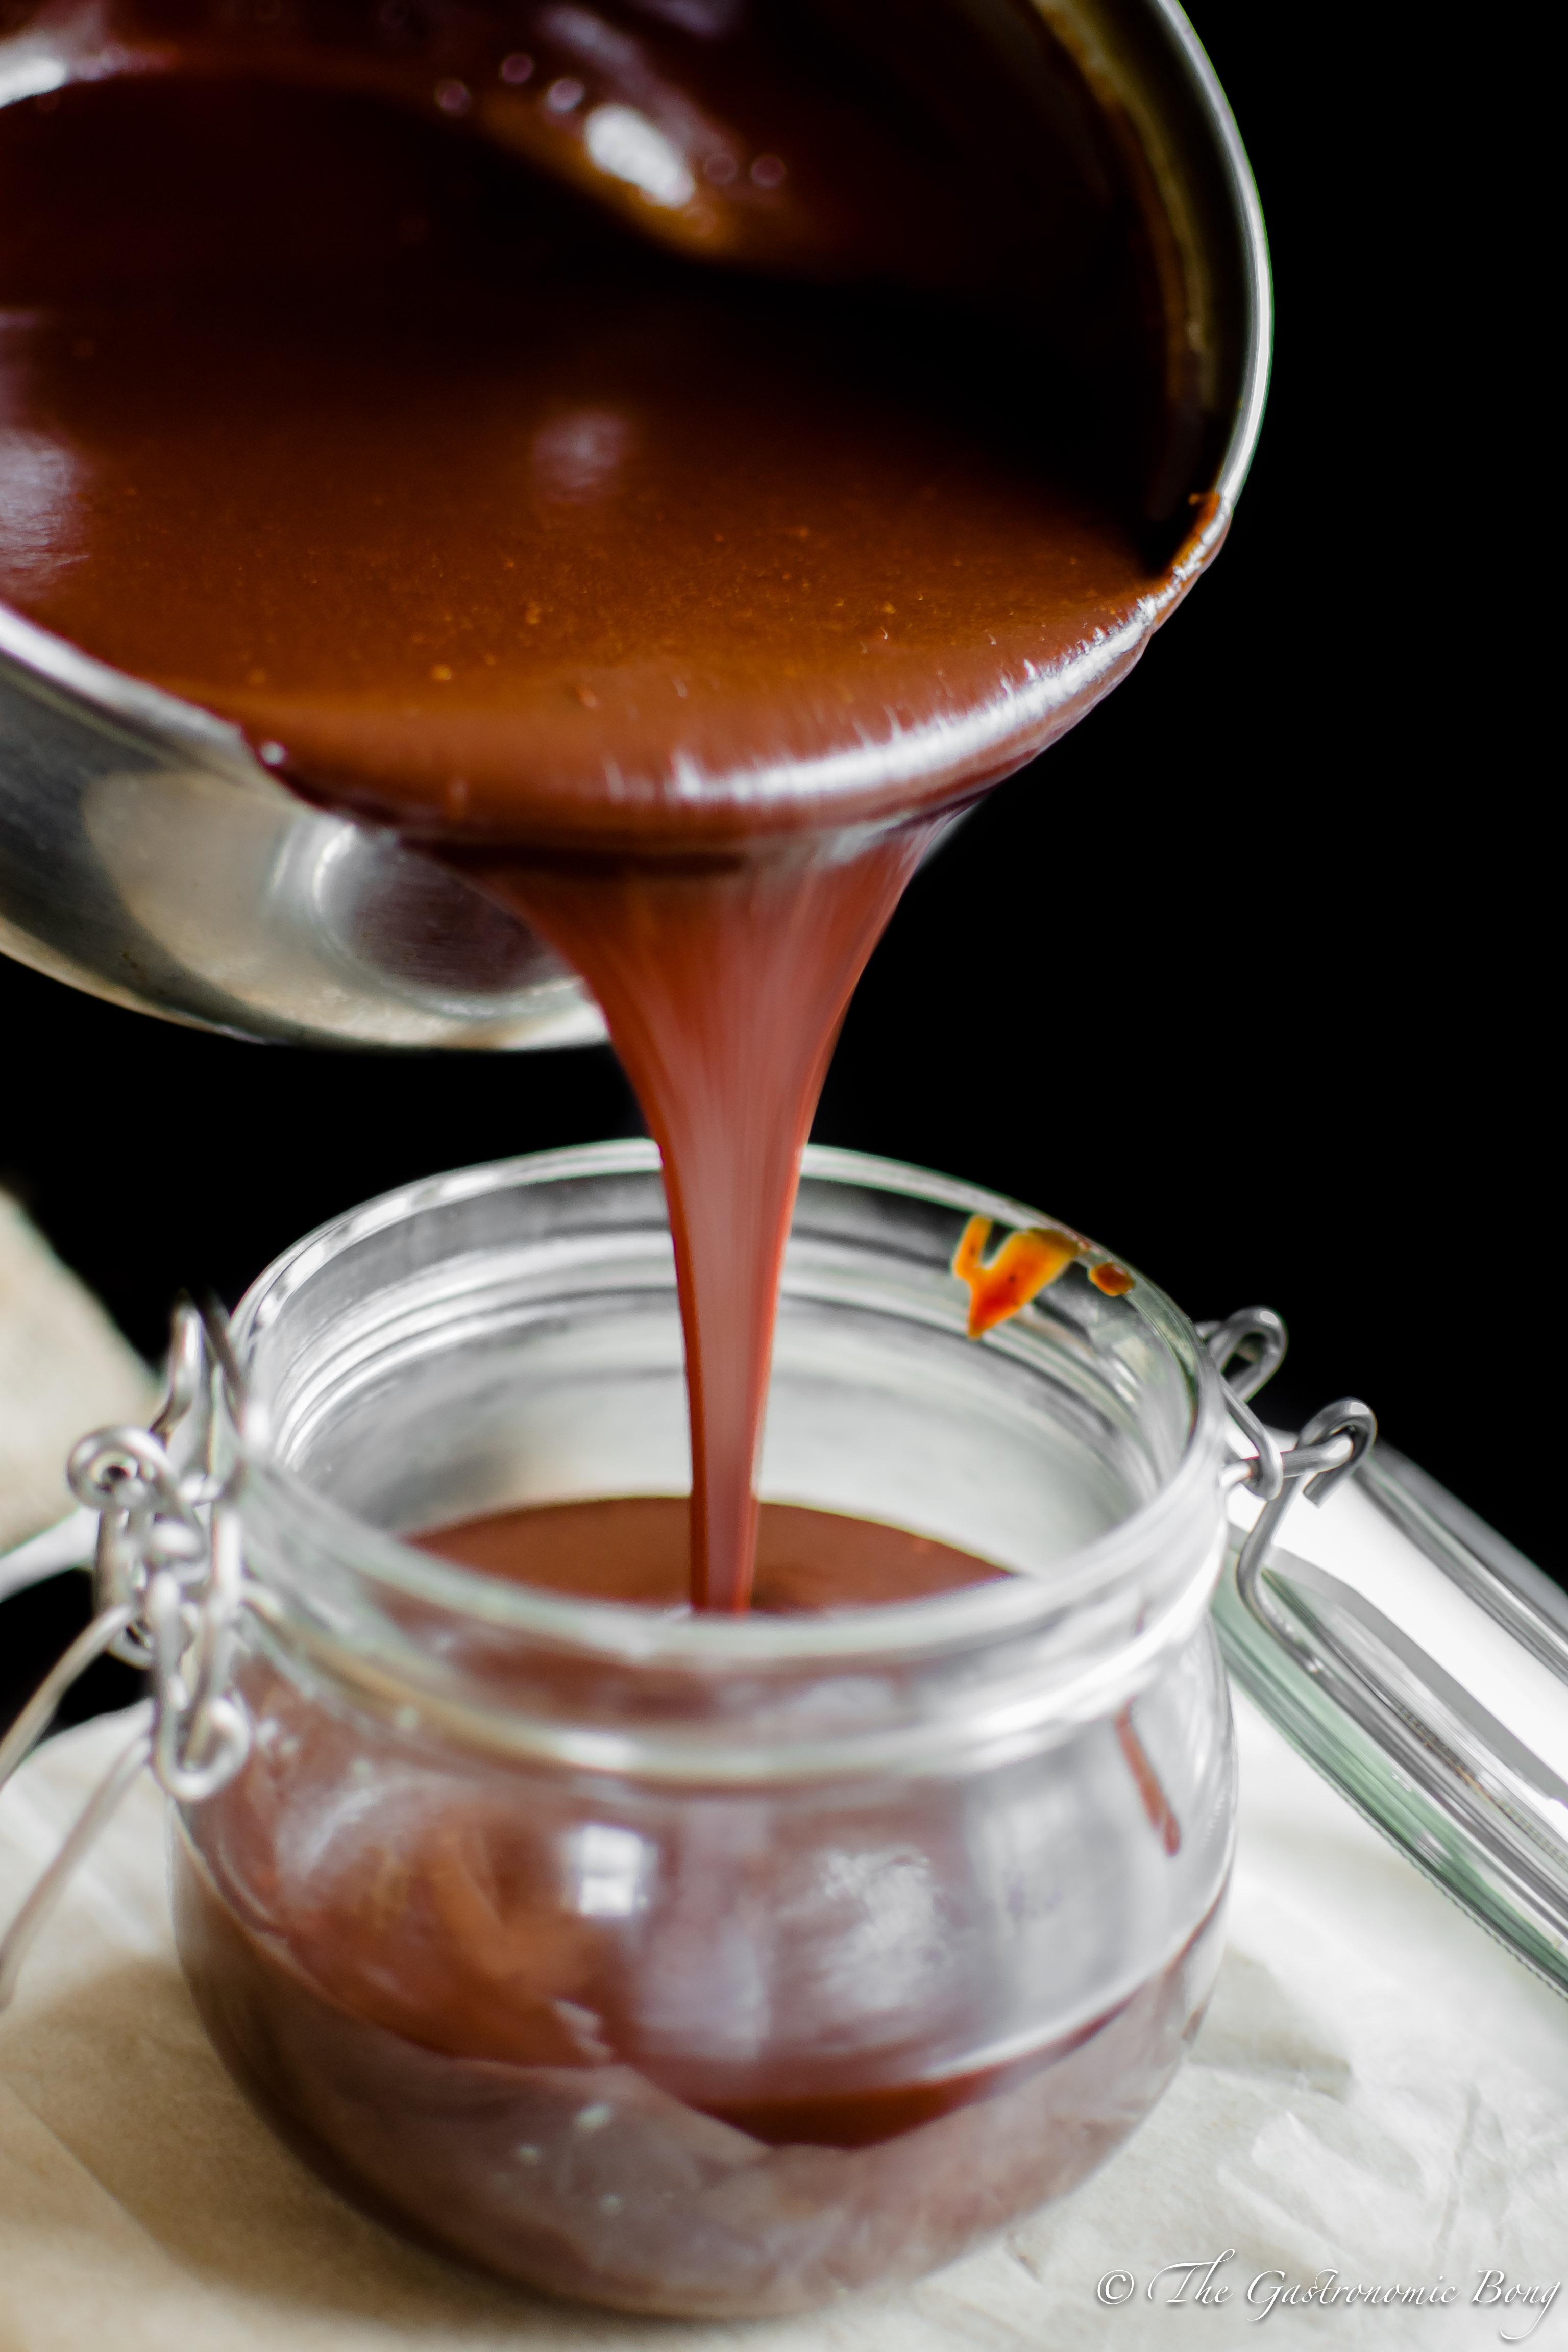 Dark Chocolate Salted Caramel Sauce